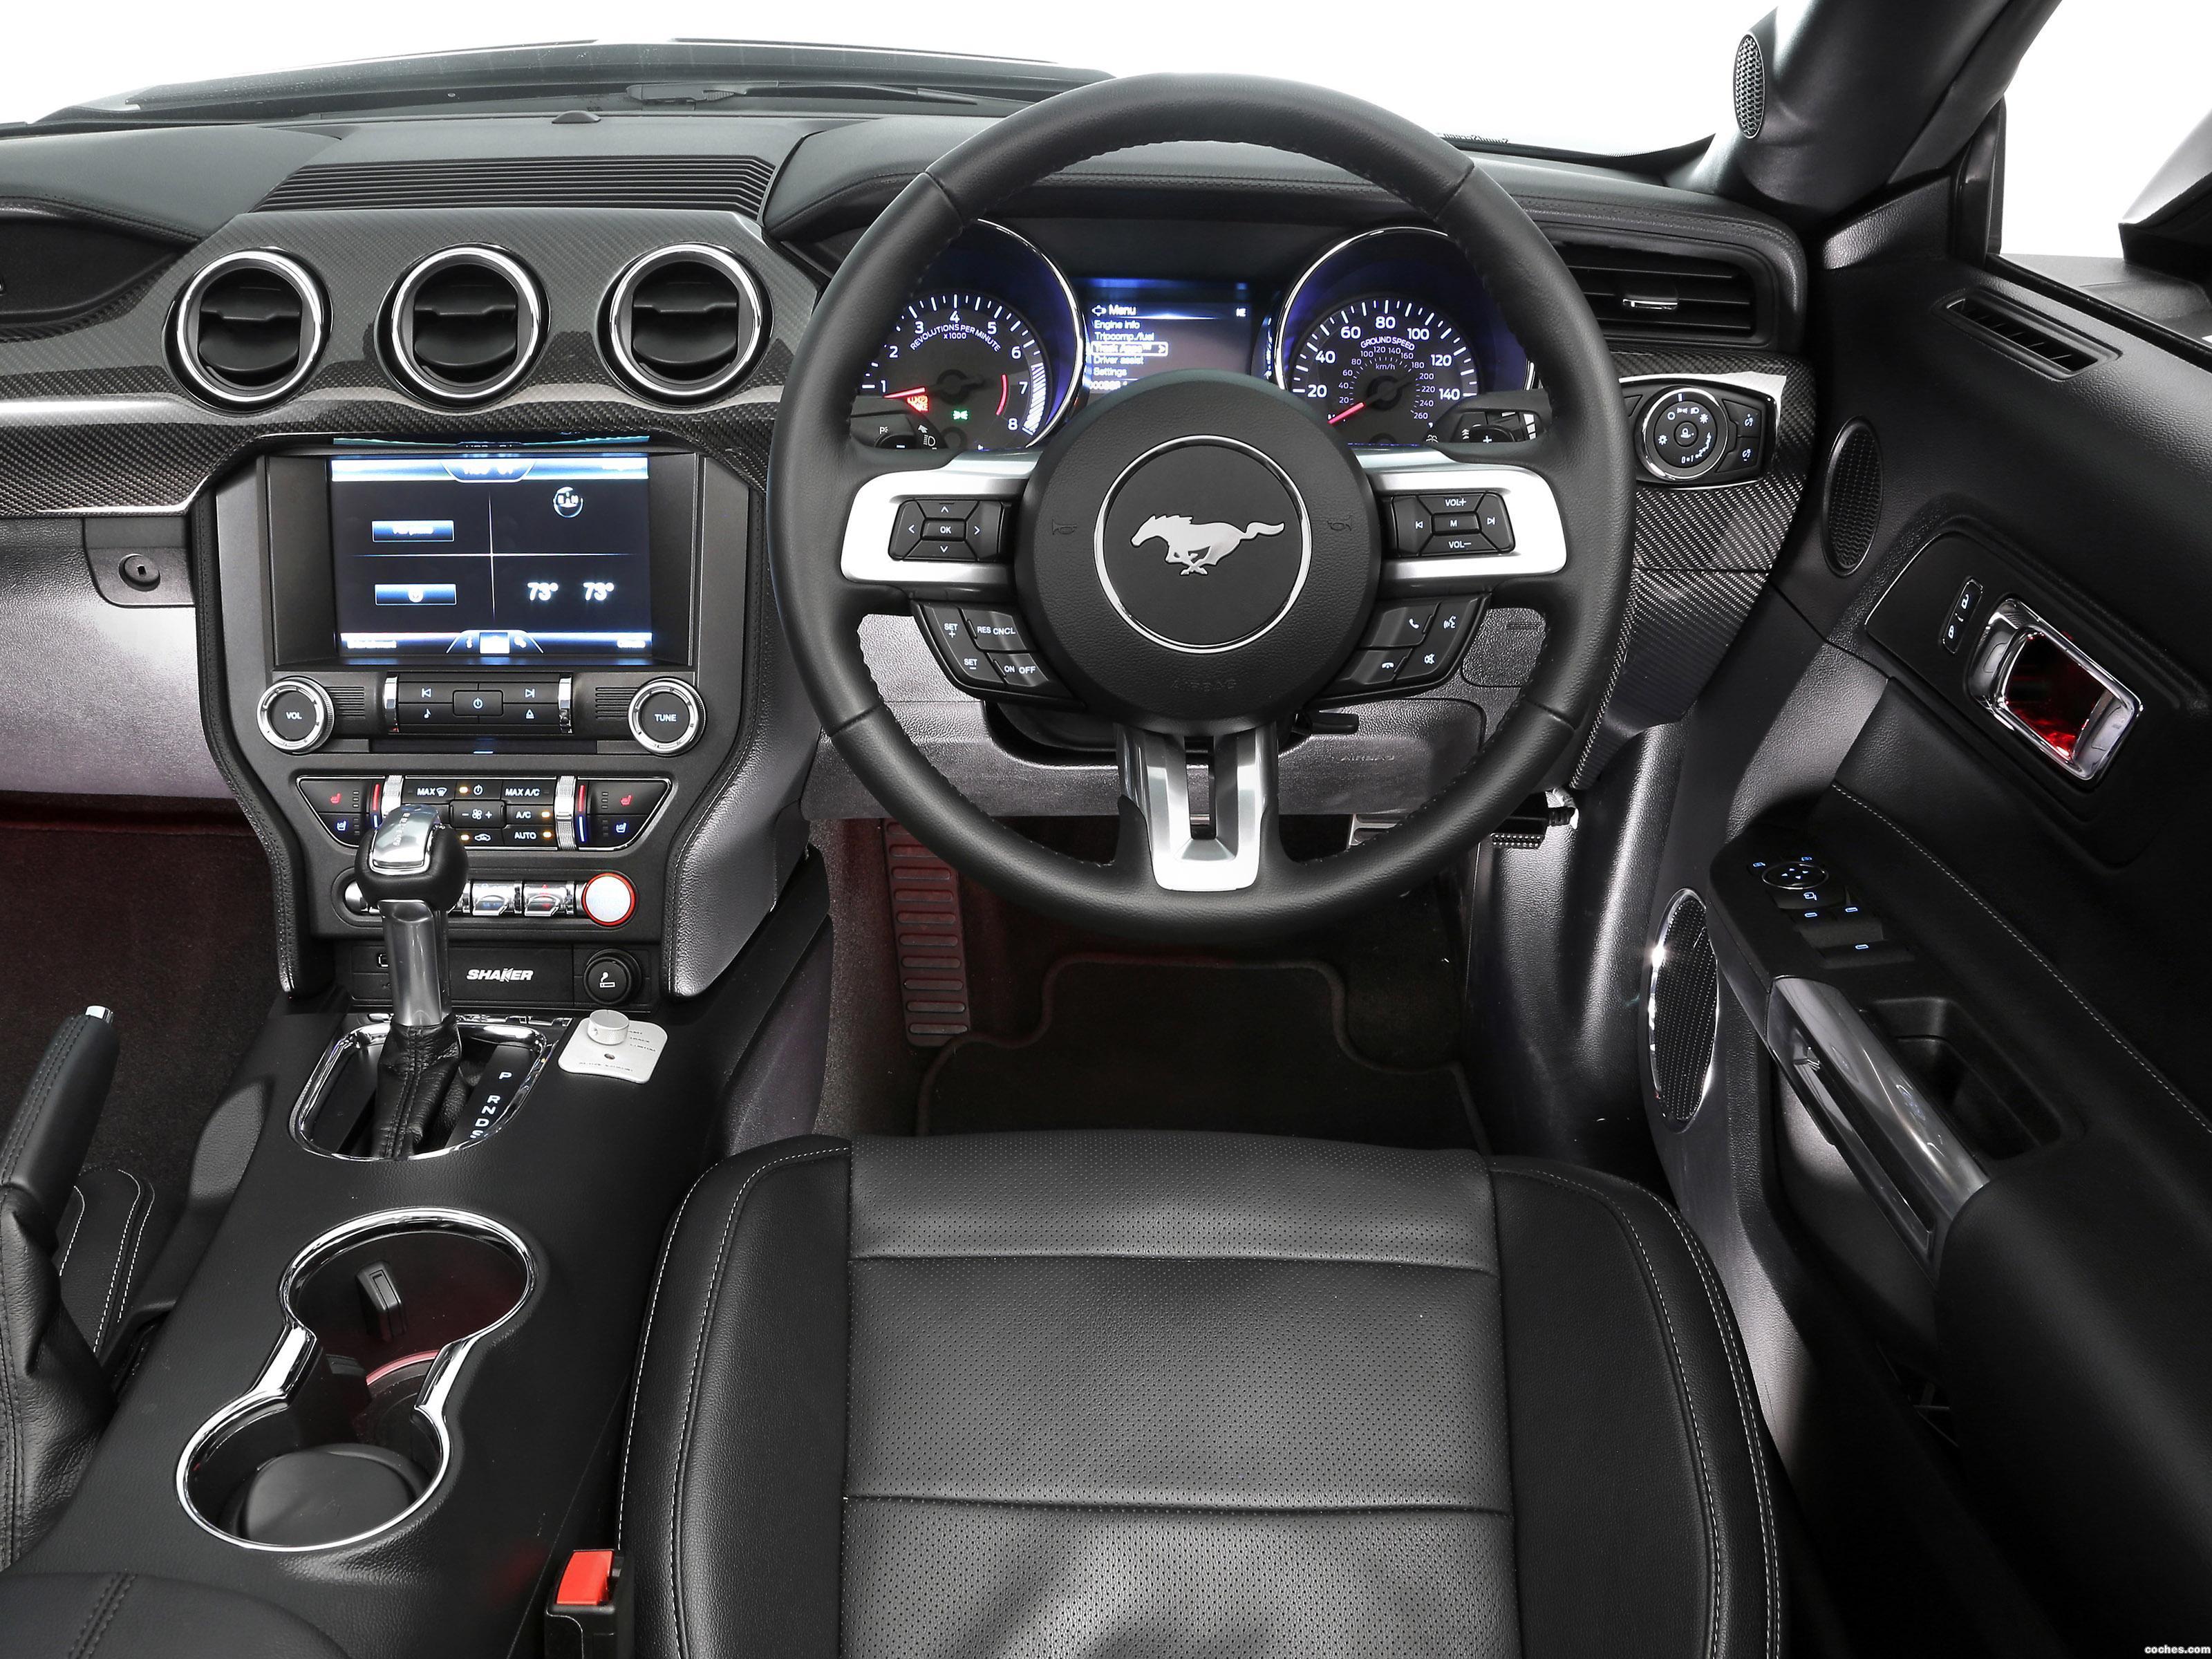 Foto 8 de Clive Sutton Ford Mustang CS500 Convertible 2016